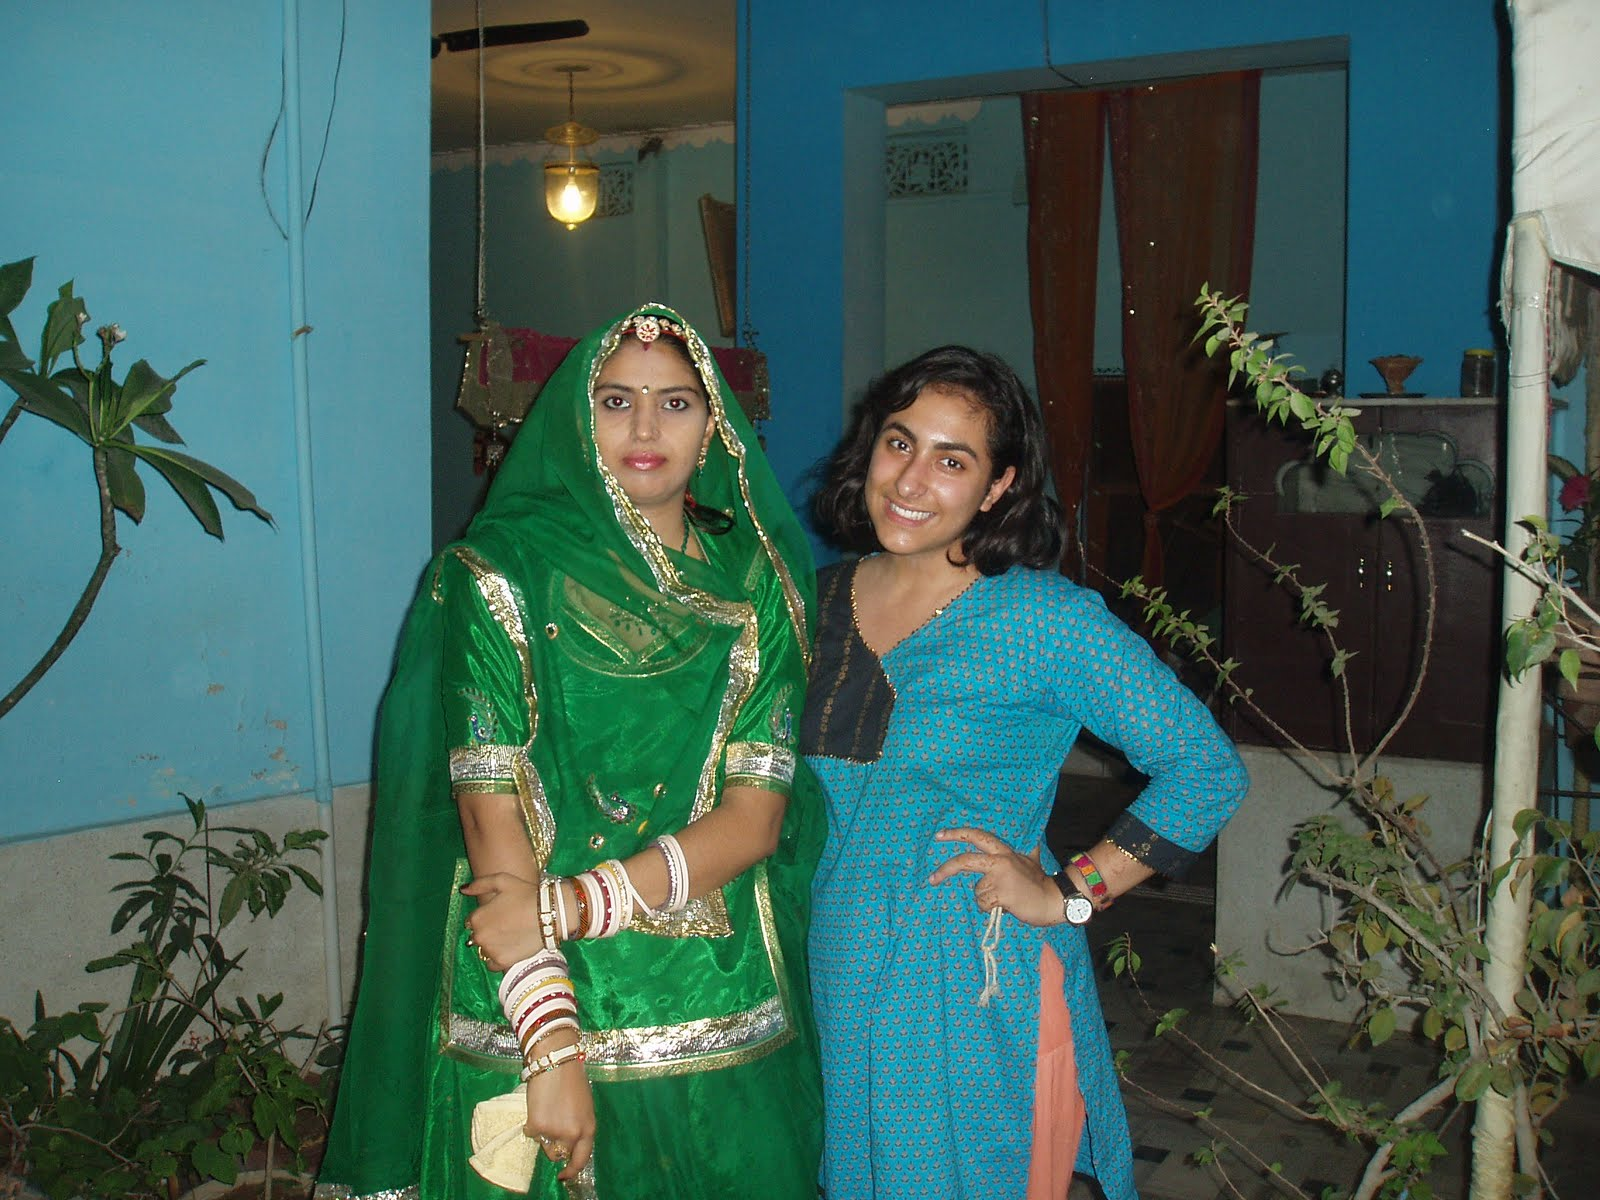 Girls in jodhpur